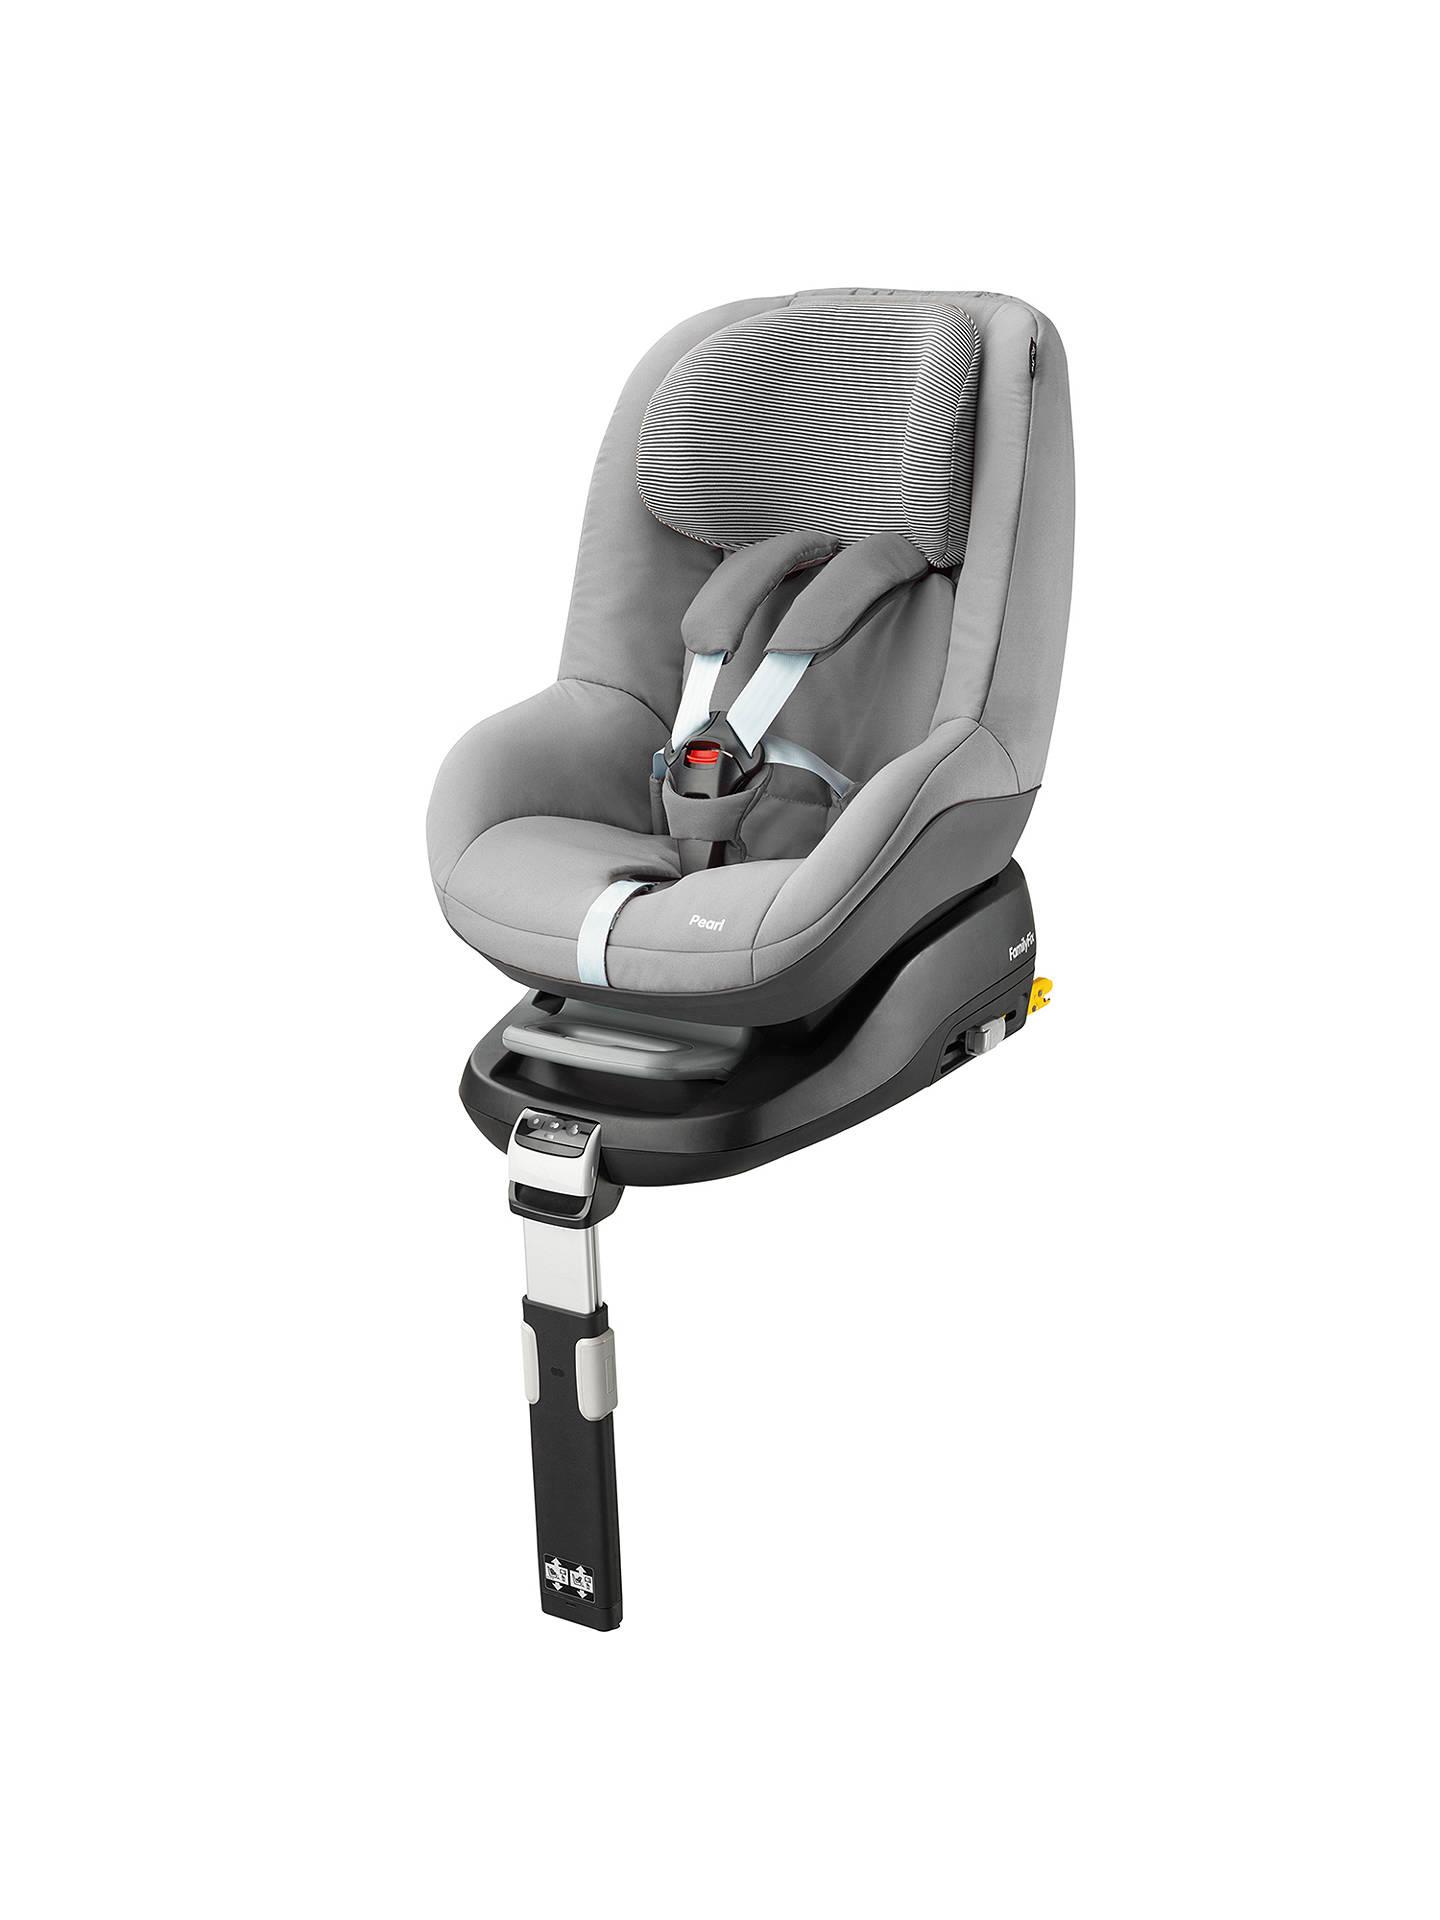 maxi cosi pearl group 1 car seat concrete grey at john. Black Bedroom Furniture Sets. Home Design Ideas